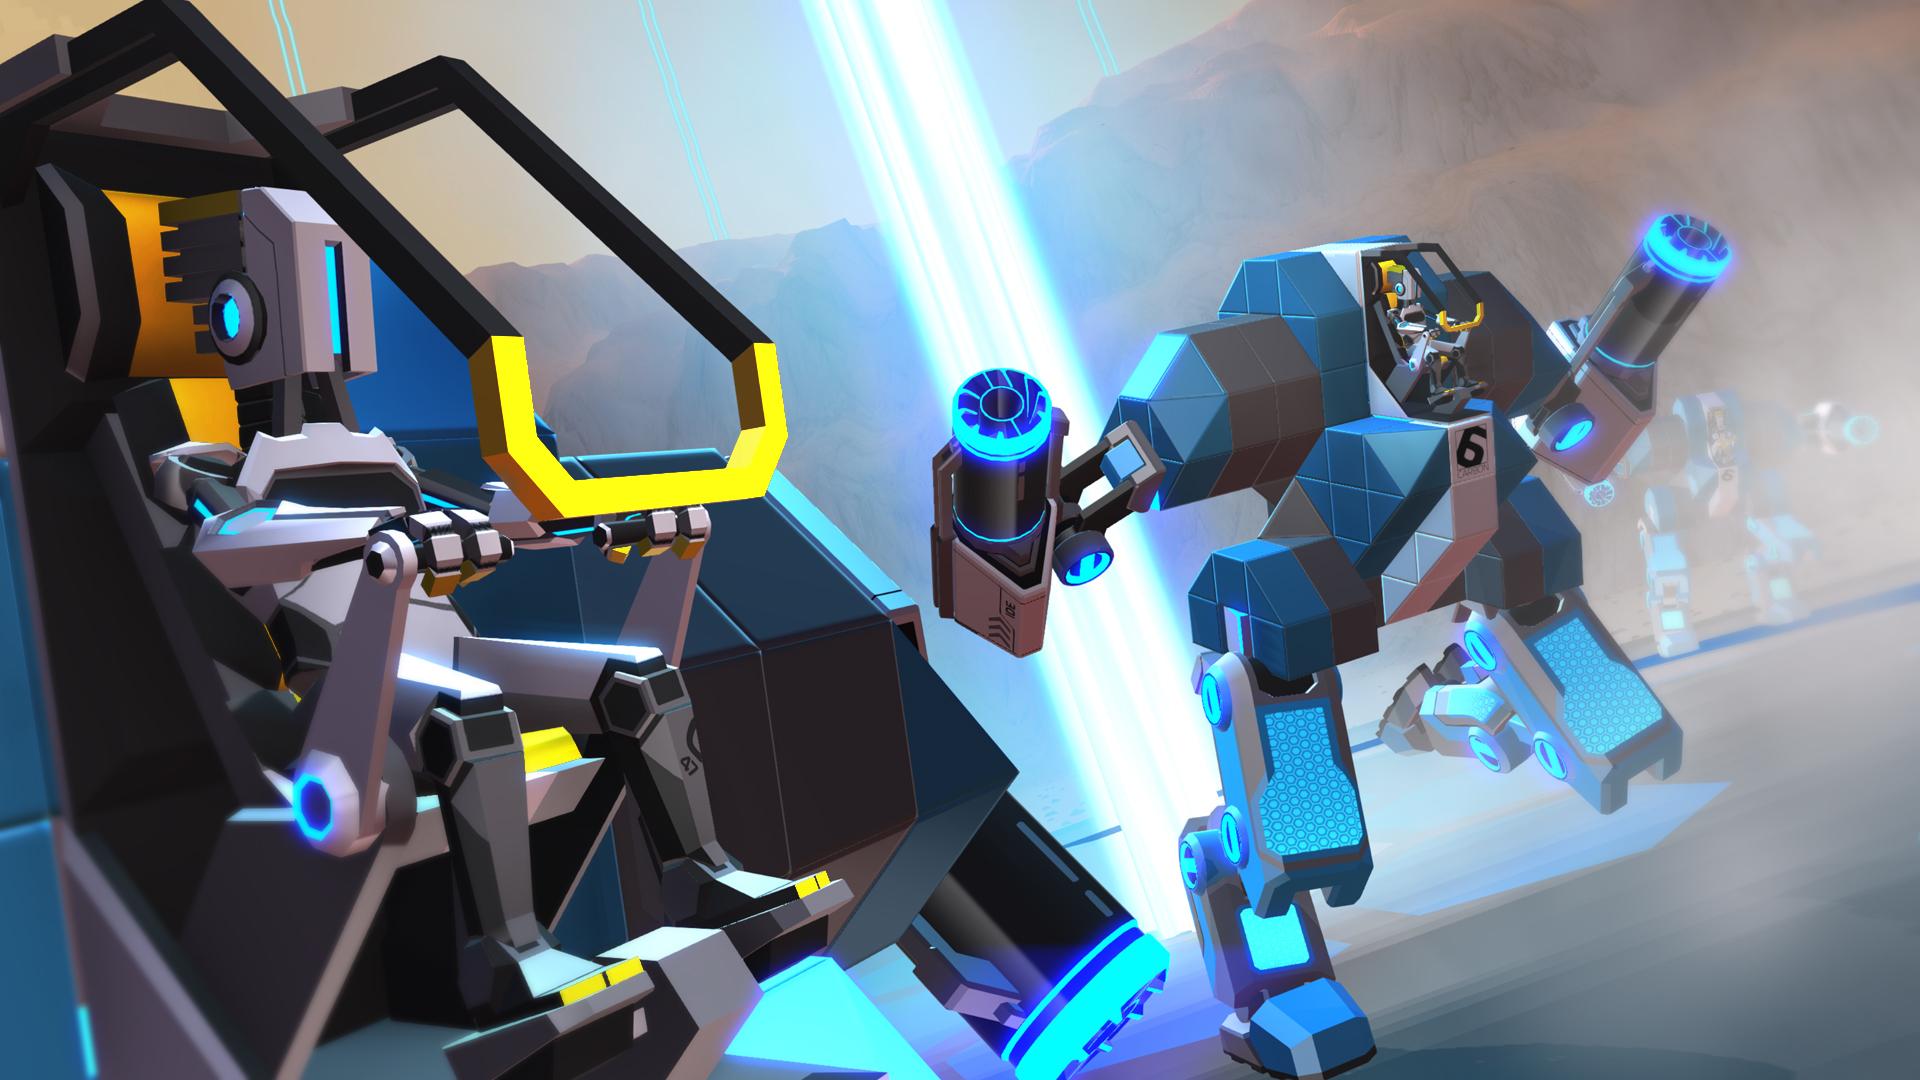 Robocraft :: Robocraft Exiting Early Access Next Week